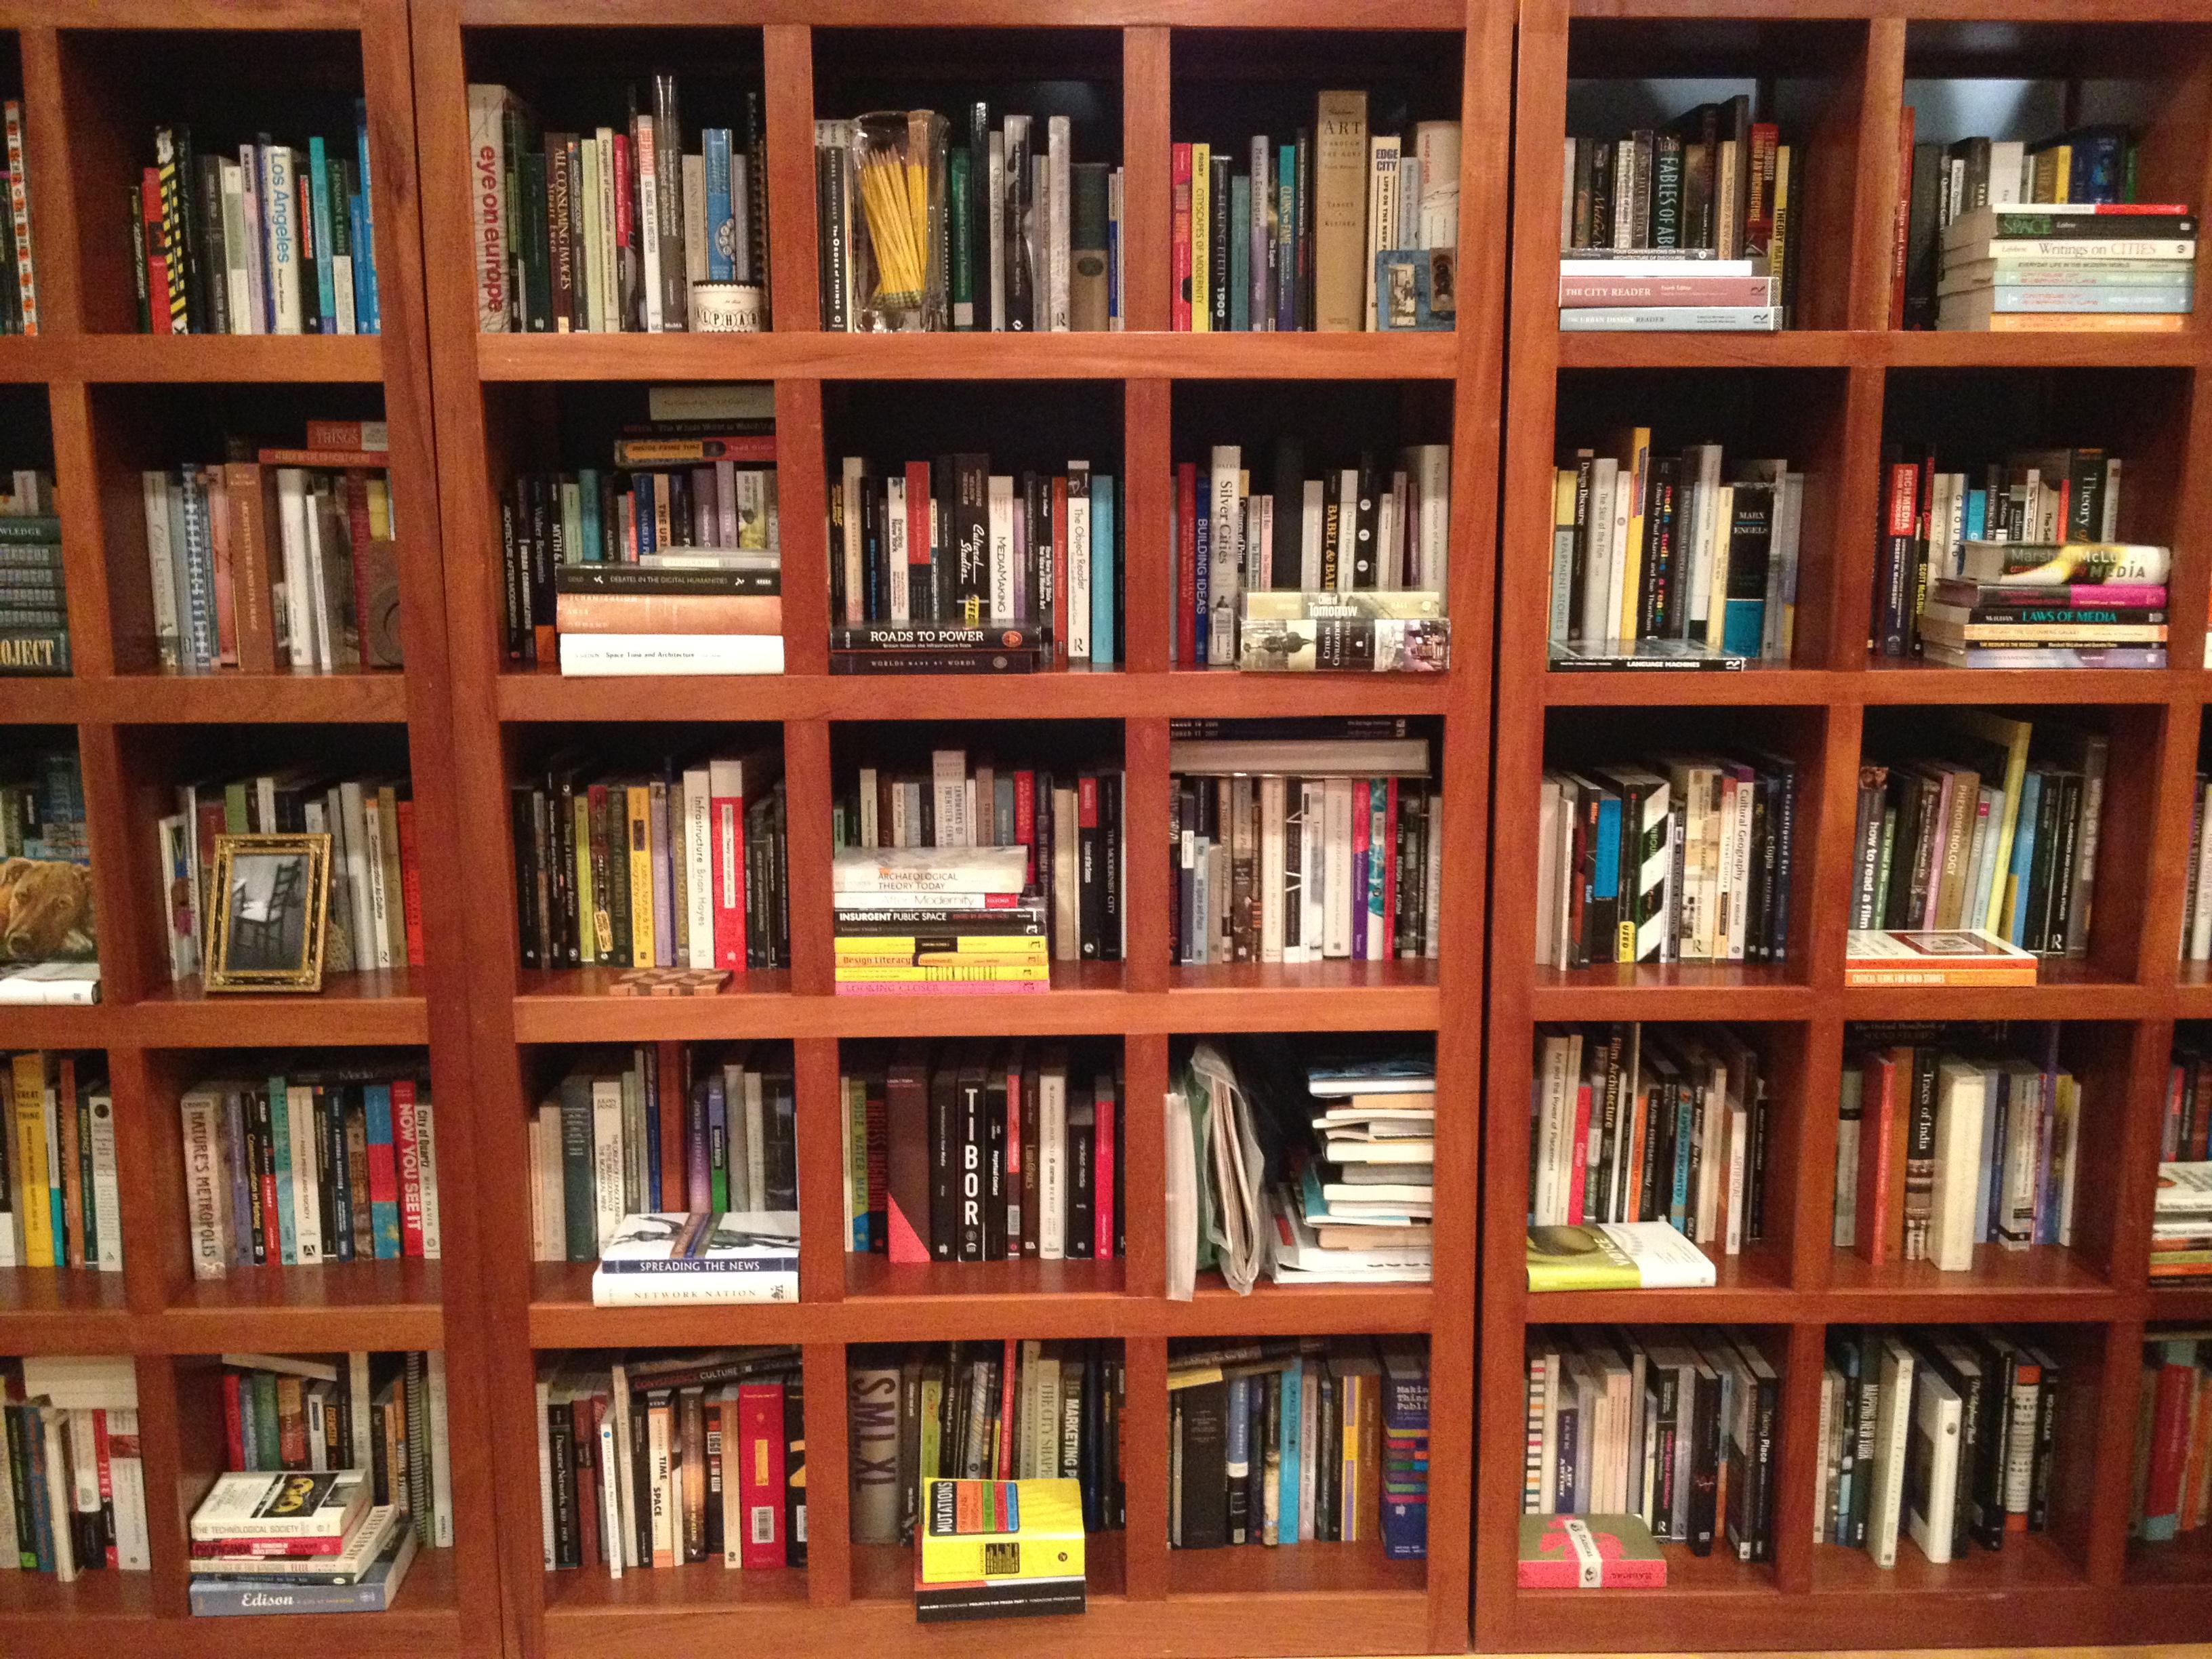 The Woodward Financial Advisors Bookshelf: What We're Reading ...